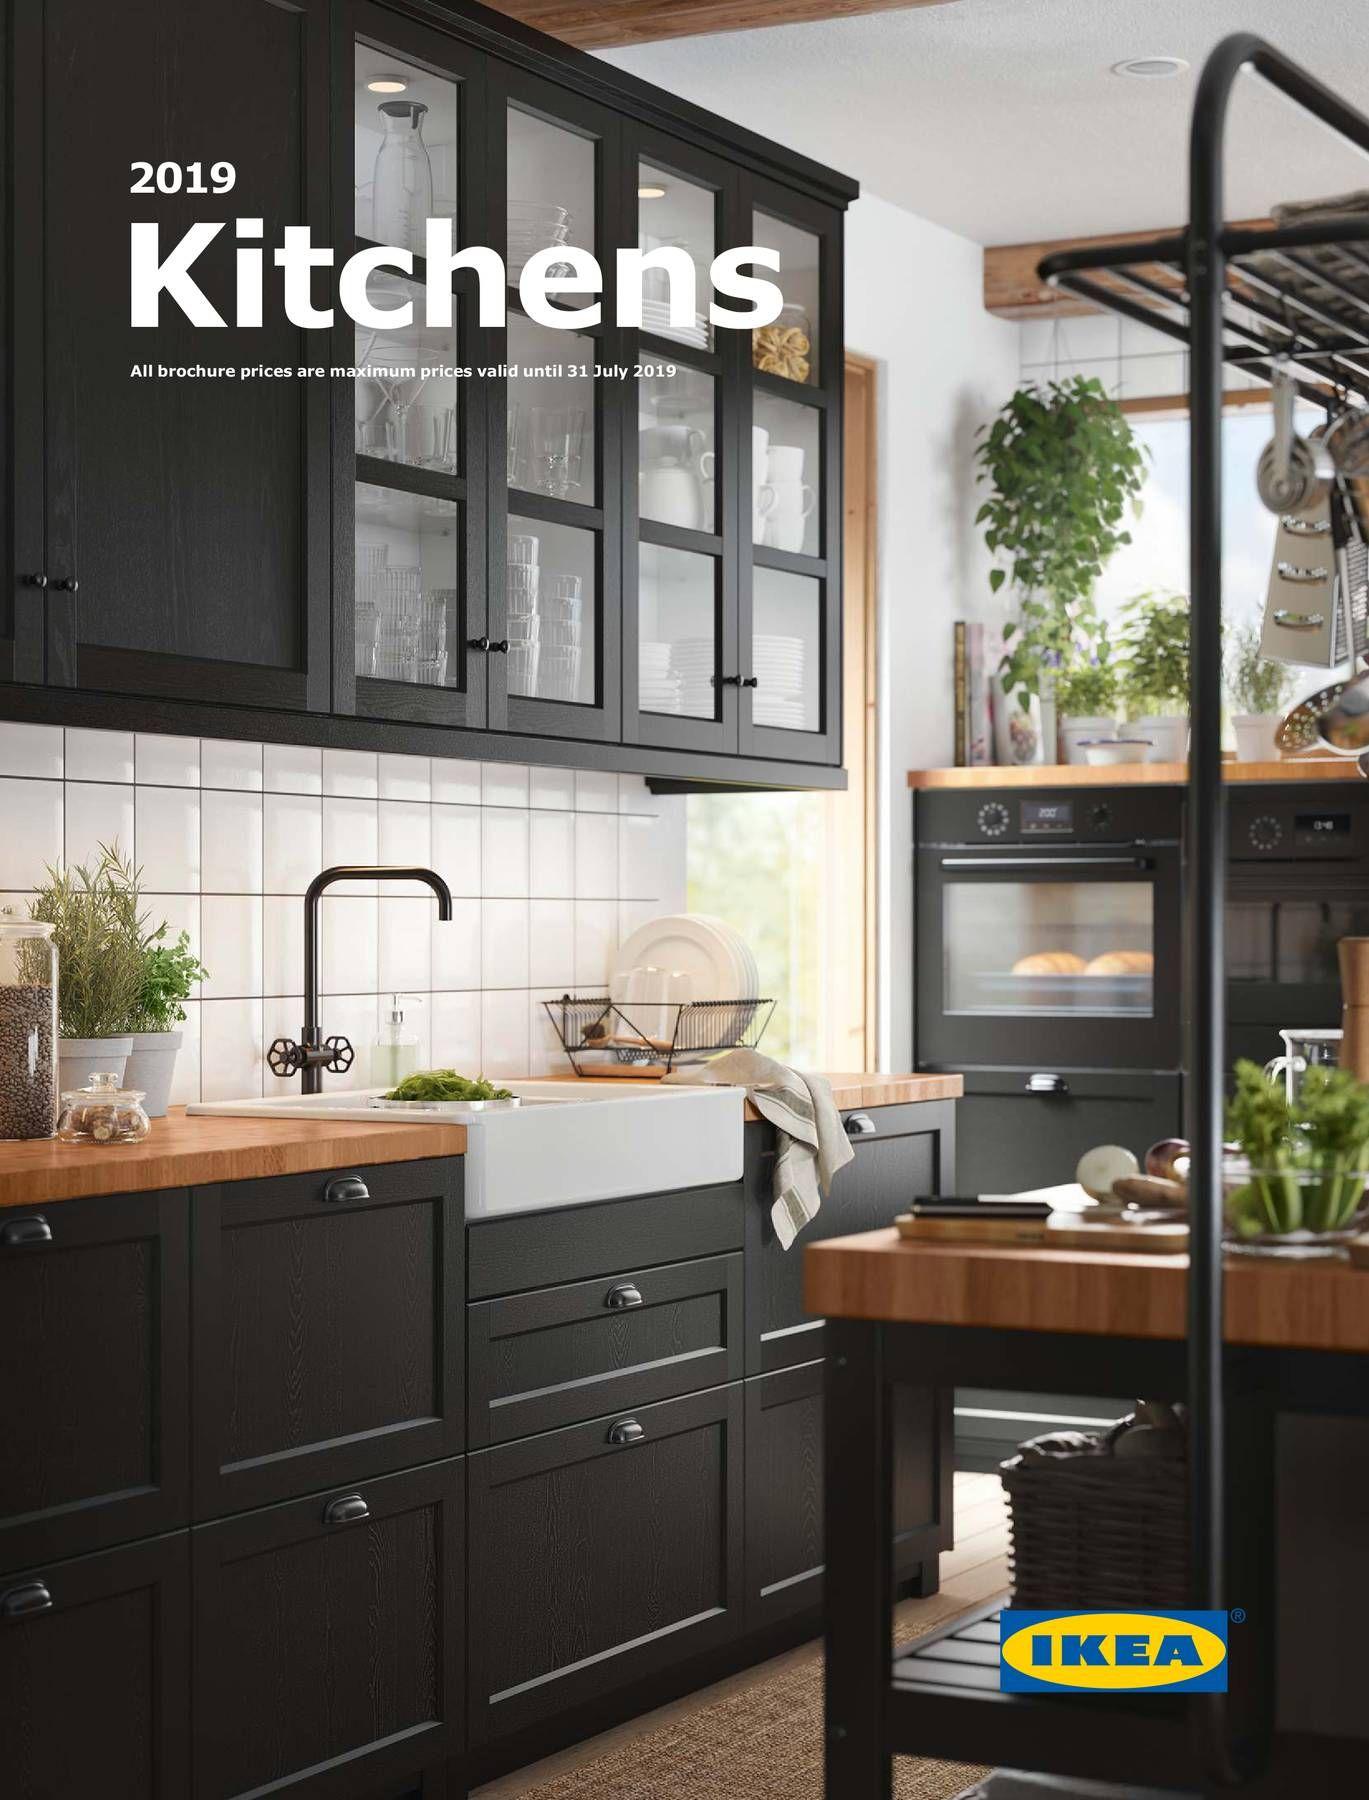 Ikea Kitchens 2019 Ikea Kitchens Offers Kitchen Renovation